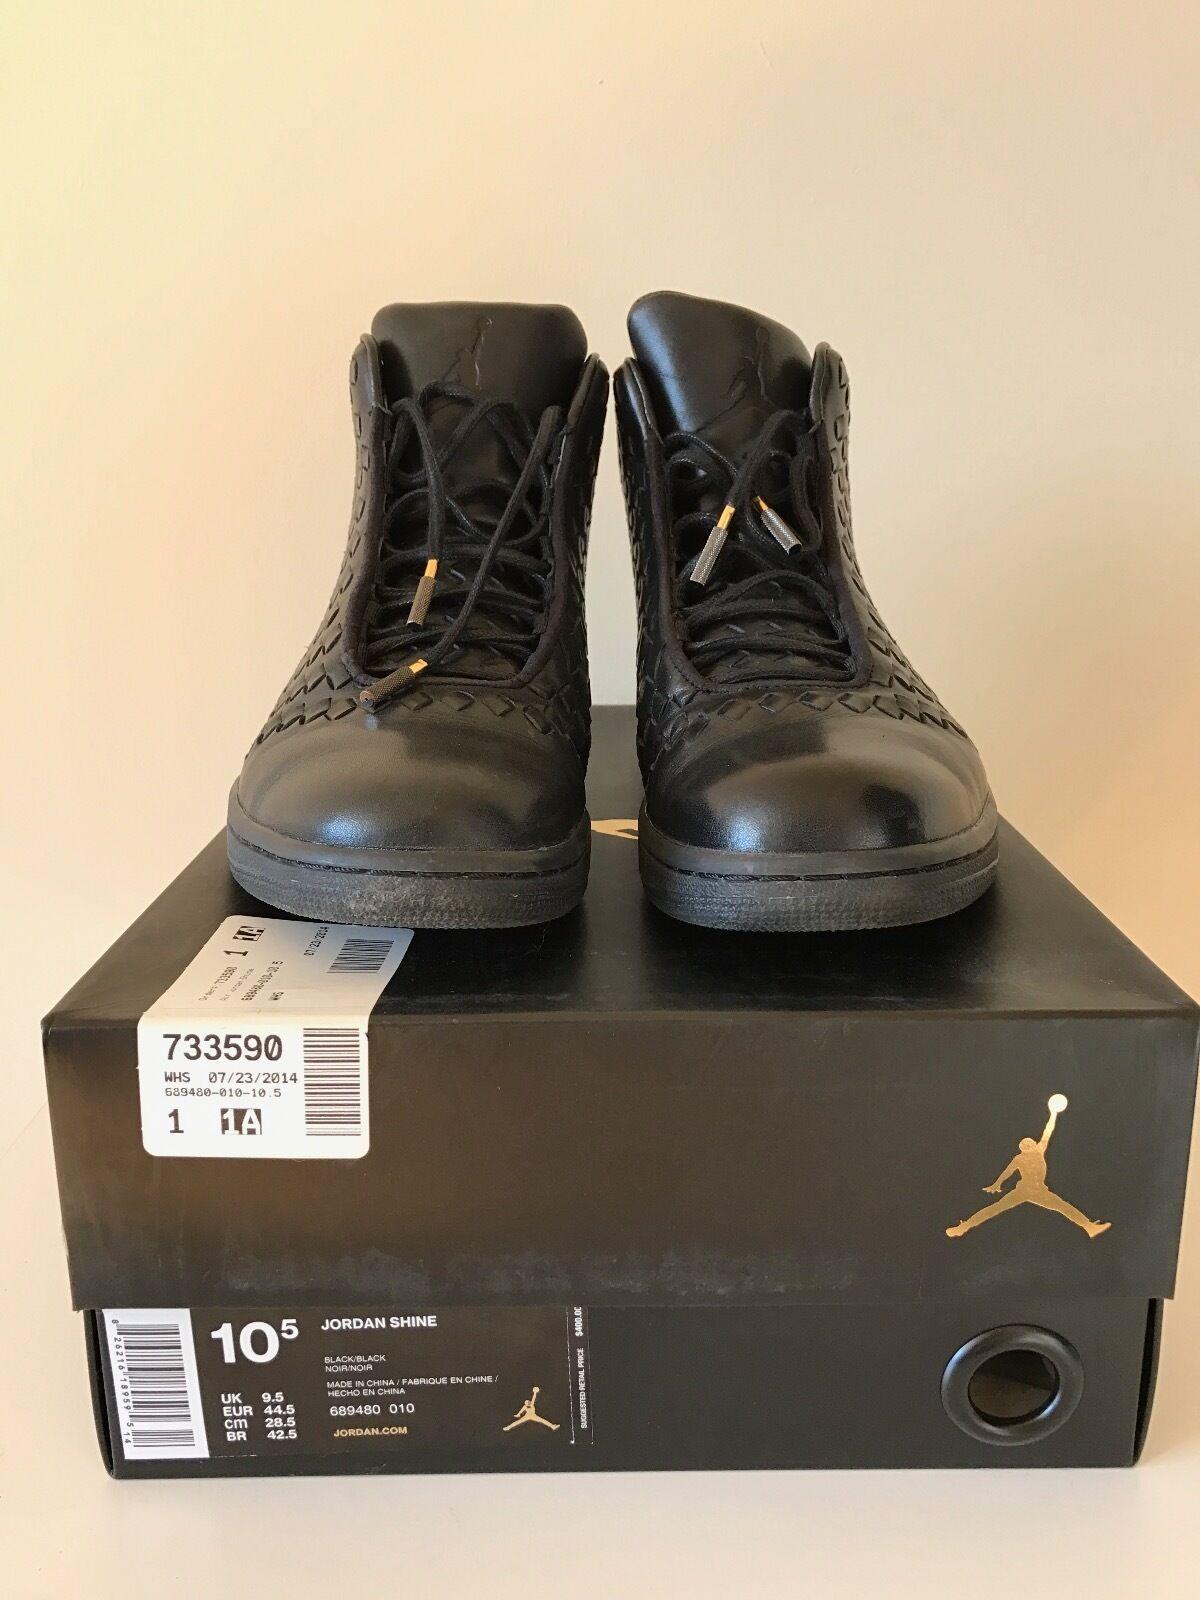 USED Nike Air Jordan - Shine Black sz 10.5